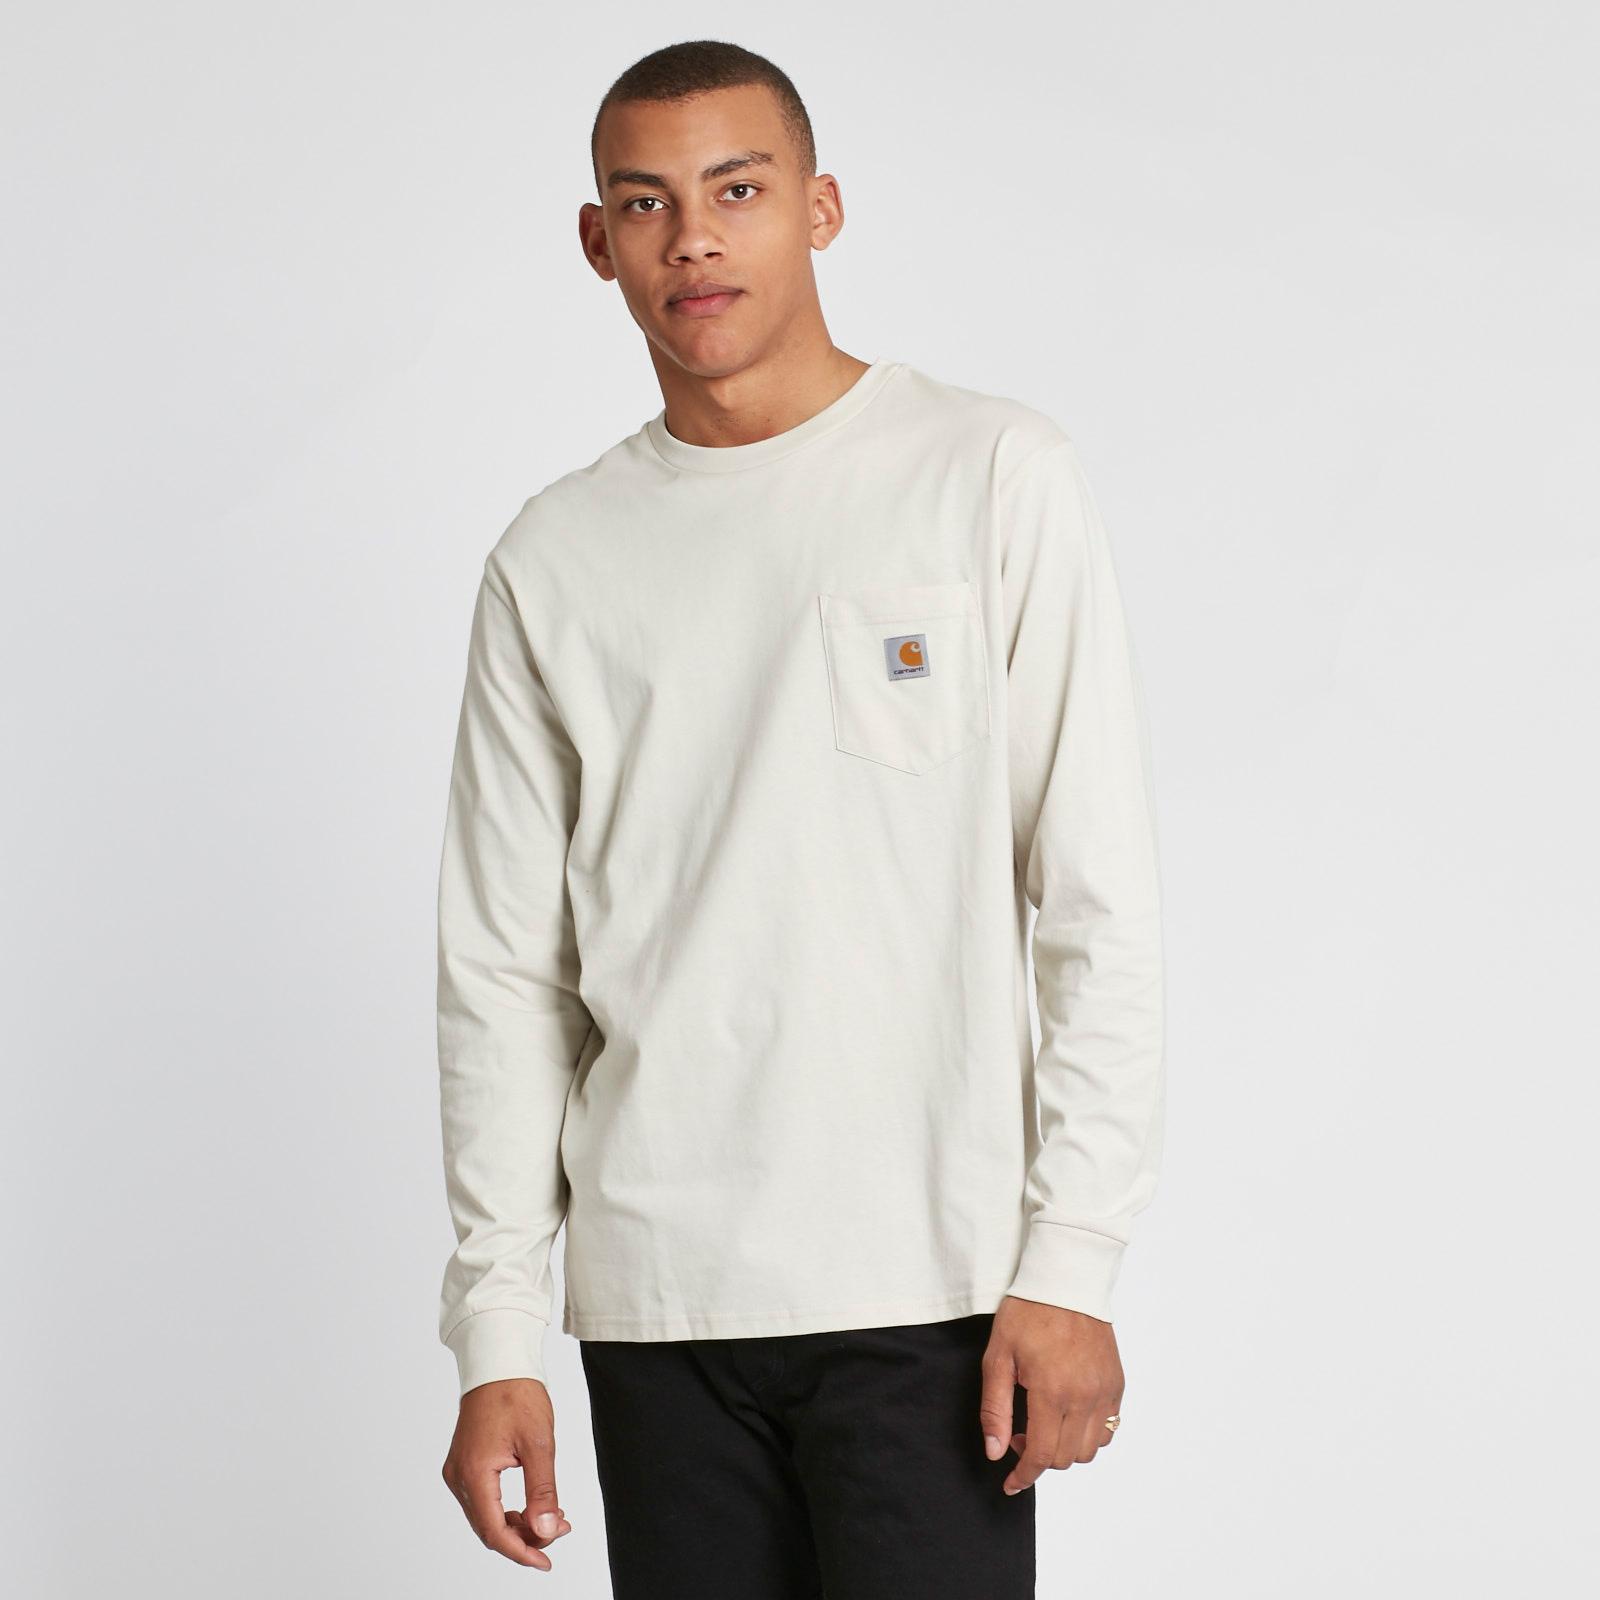 03284d95 Carhartt WIP L/S Pocket T-Shirt - I022094.961.00.03 - Sneakersnstuff ...